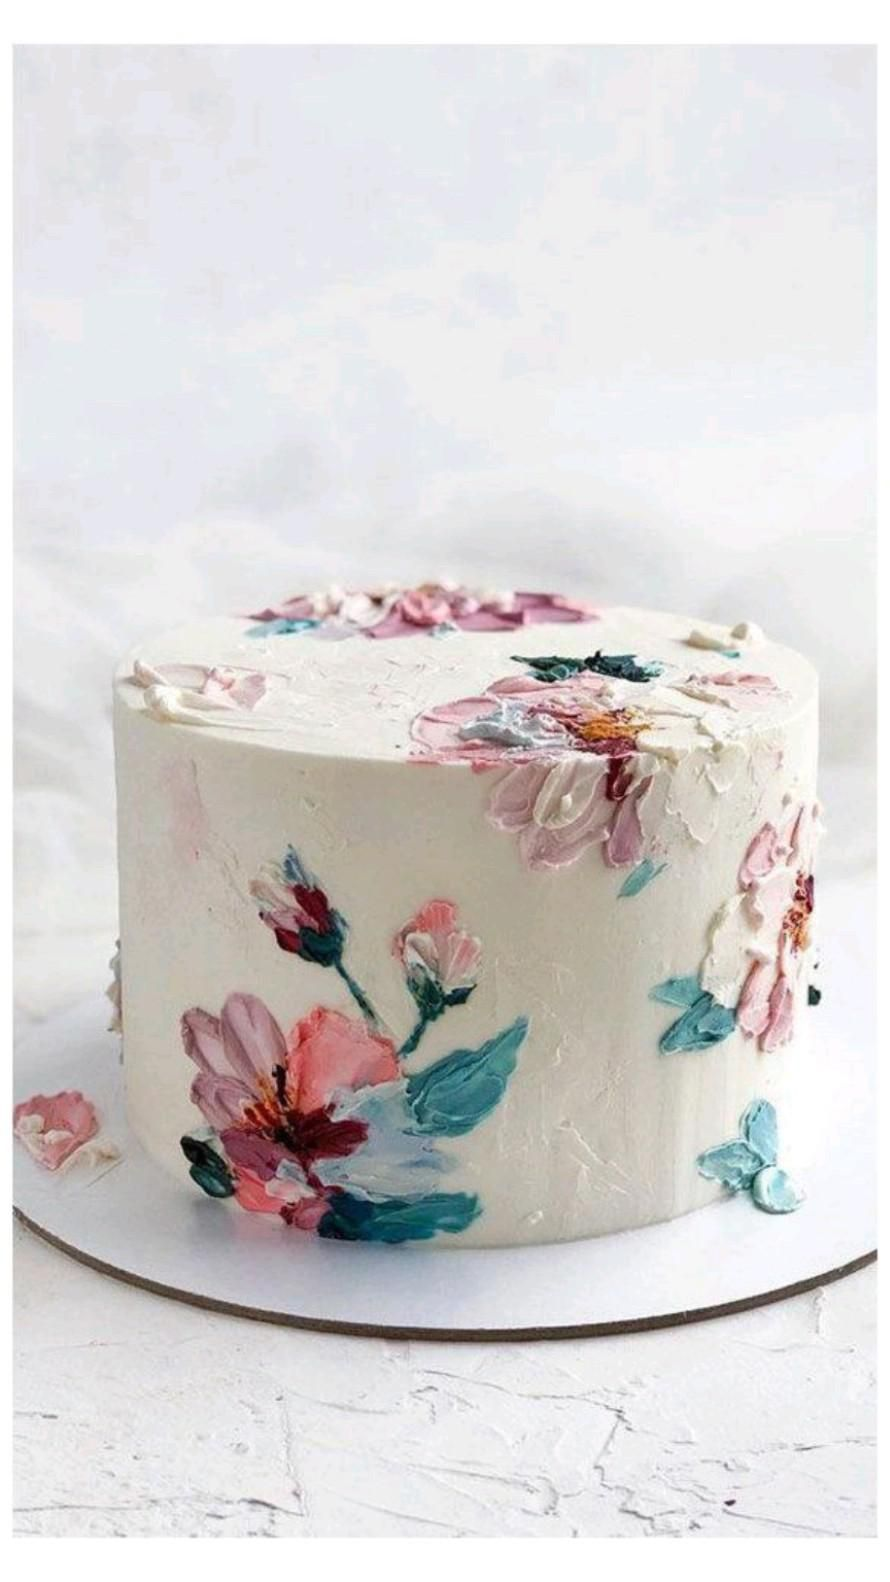 Birthday special cake design and decoration , Wedding cake design, college final year cake